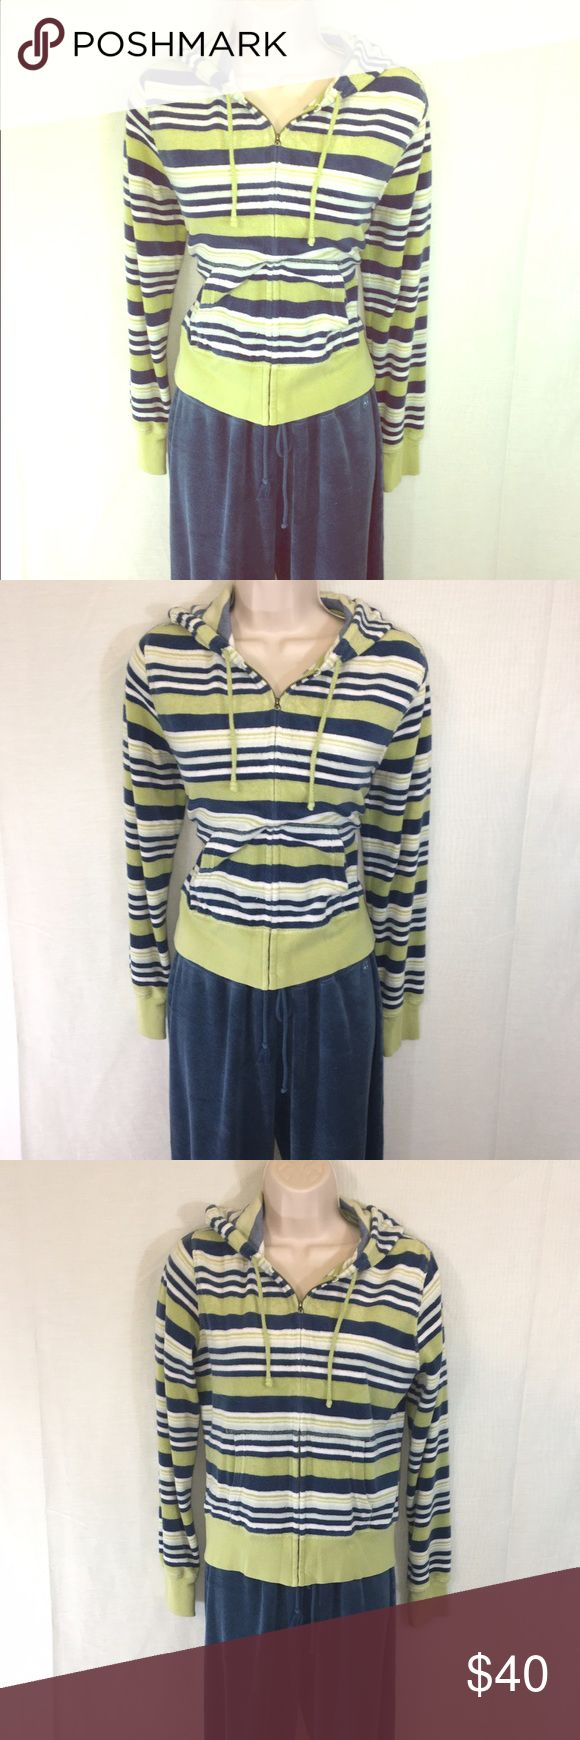 Selling this American Eagle Outfitters Jogging Suit-M on Poshmark! My username is: claudiamae16. #shopmycloset #poshmark #fashion #shopping #style #forsale #American Eagle Outfitters #Jackets & Blazers